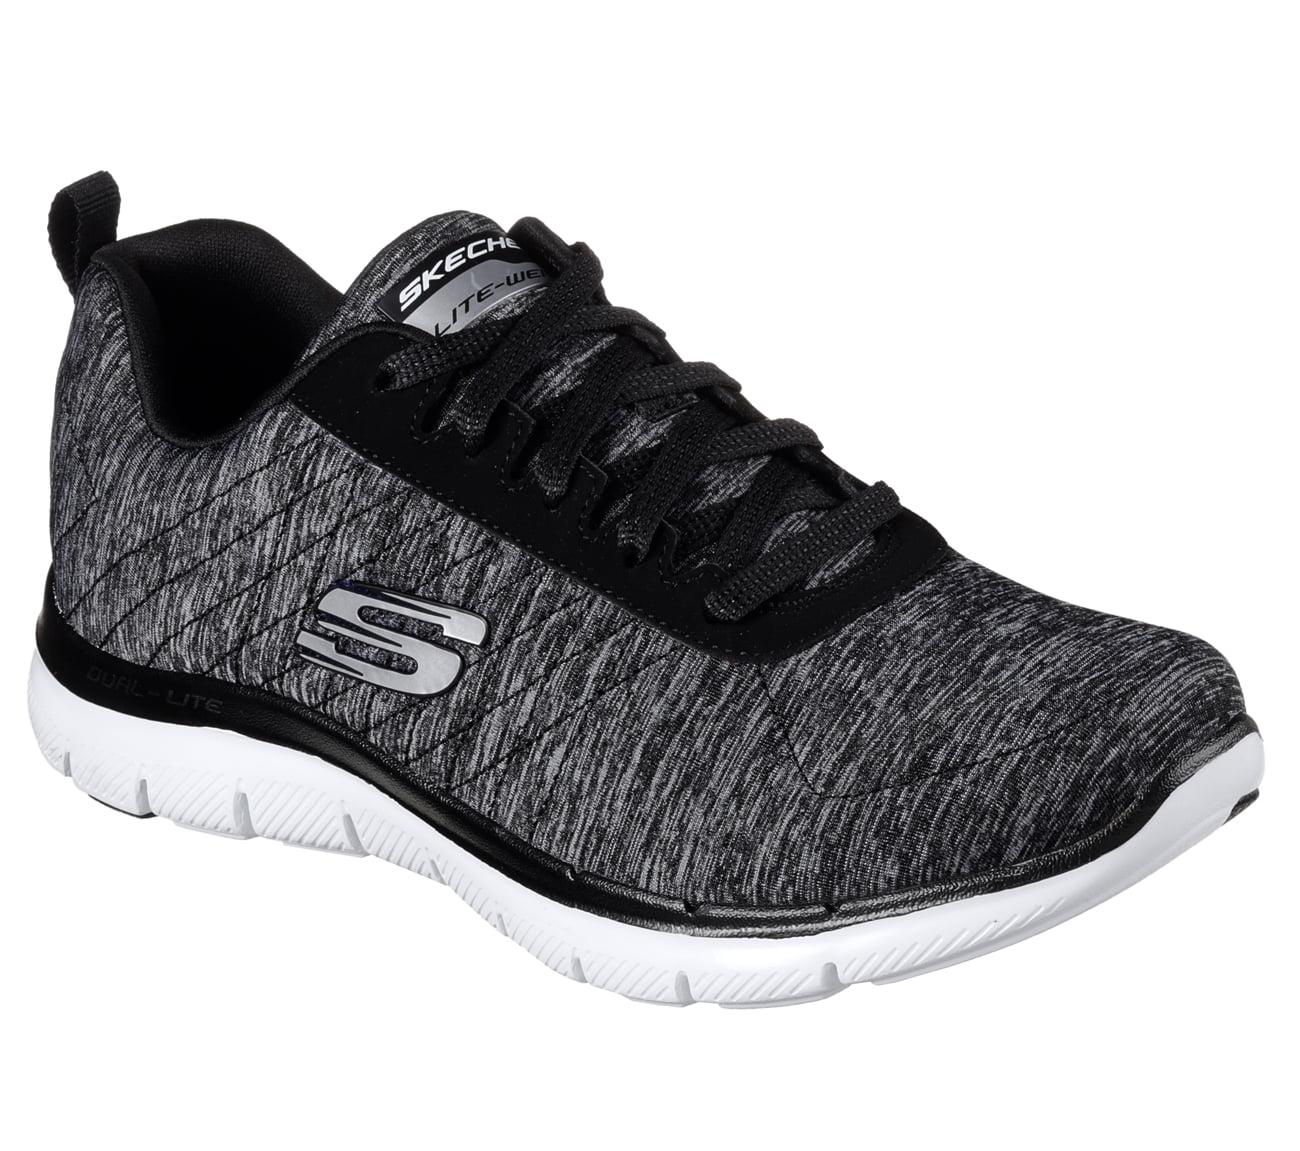 FLEX APPEAL 2.0 Training Shoes